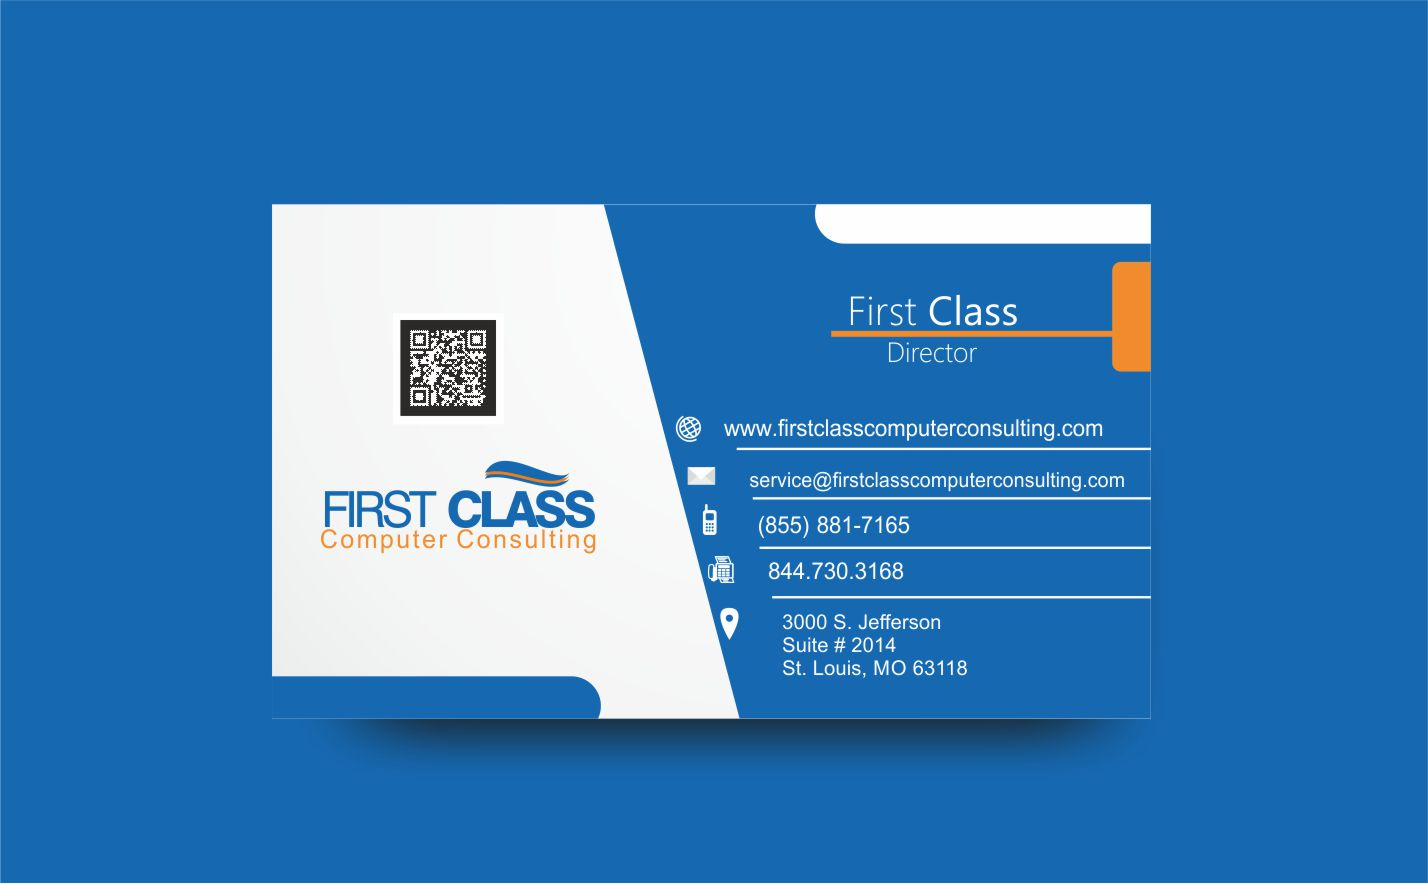 Elegant, Playful, Business Business Card Design for First Class ...